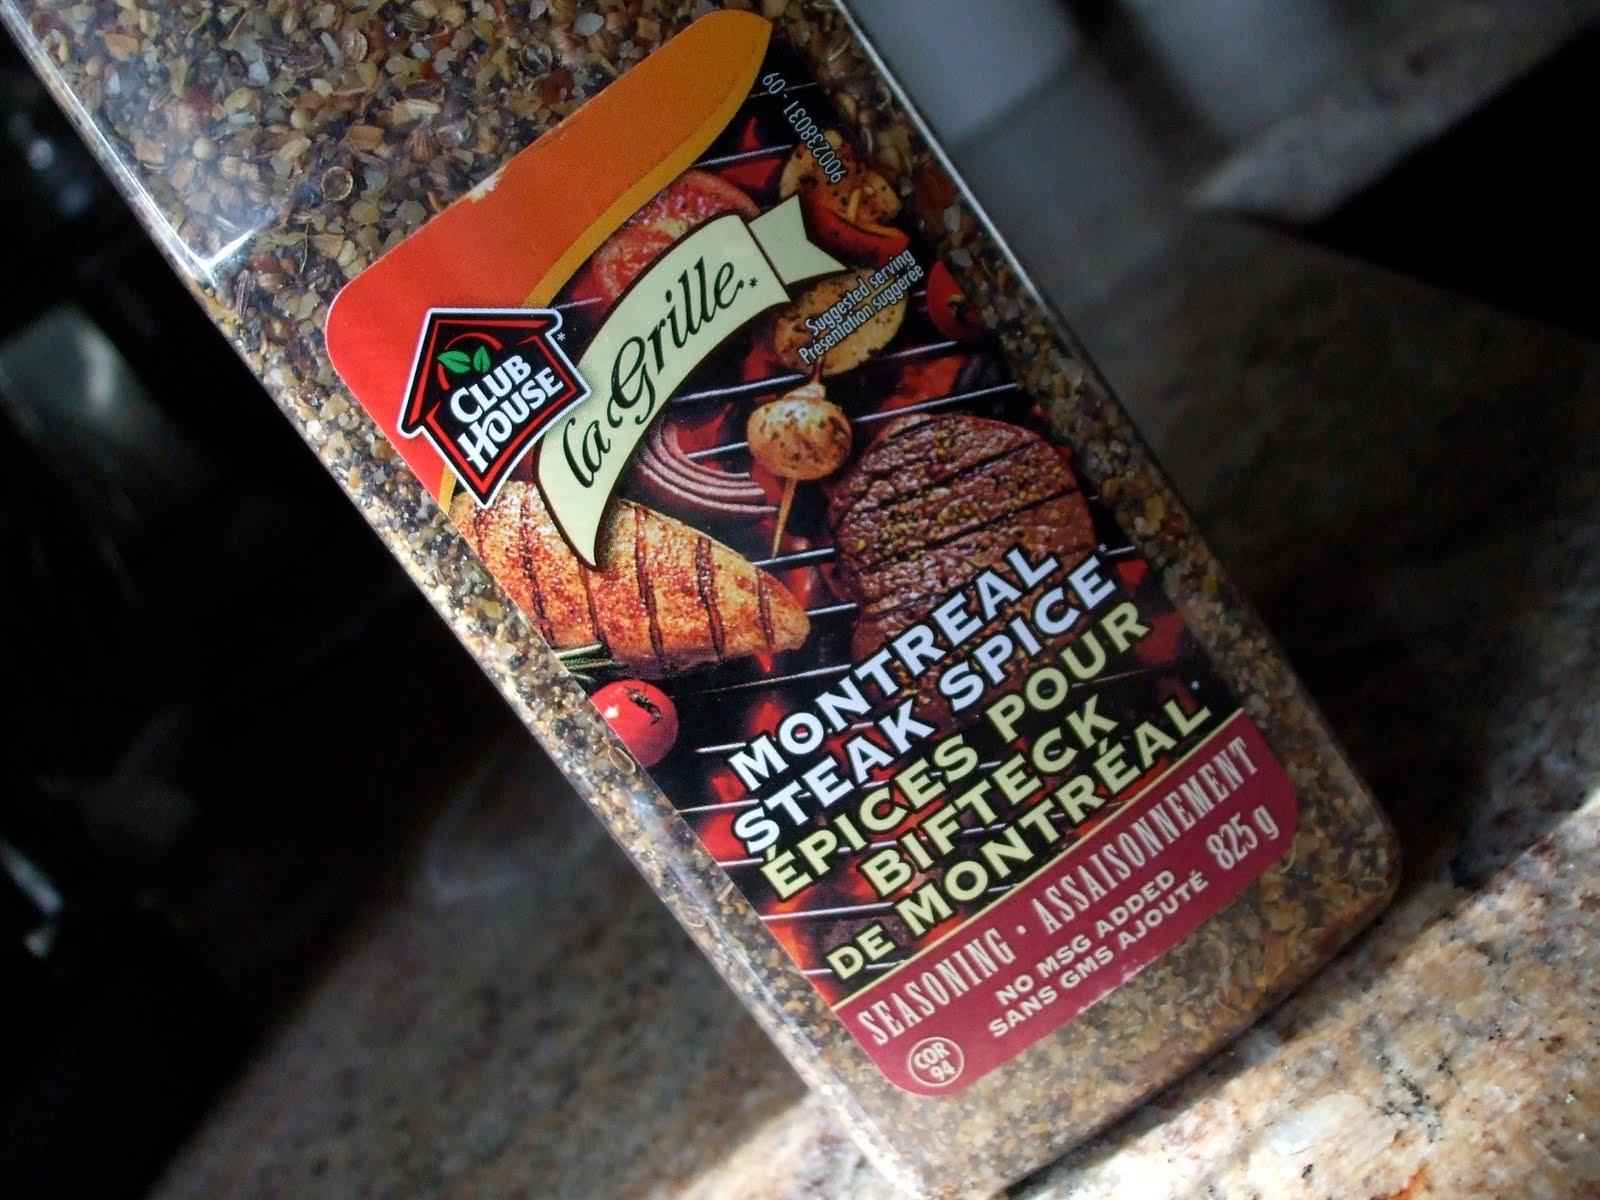 My farts smell like Montreal Steak Spice (dead srs) - Bodybuilding